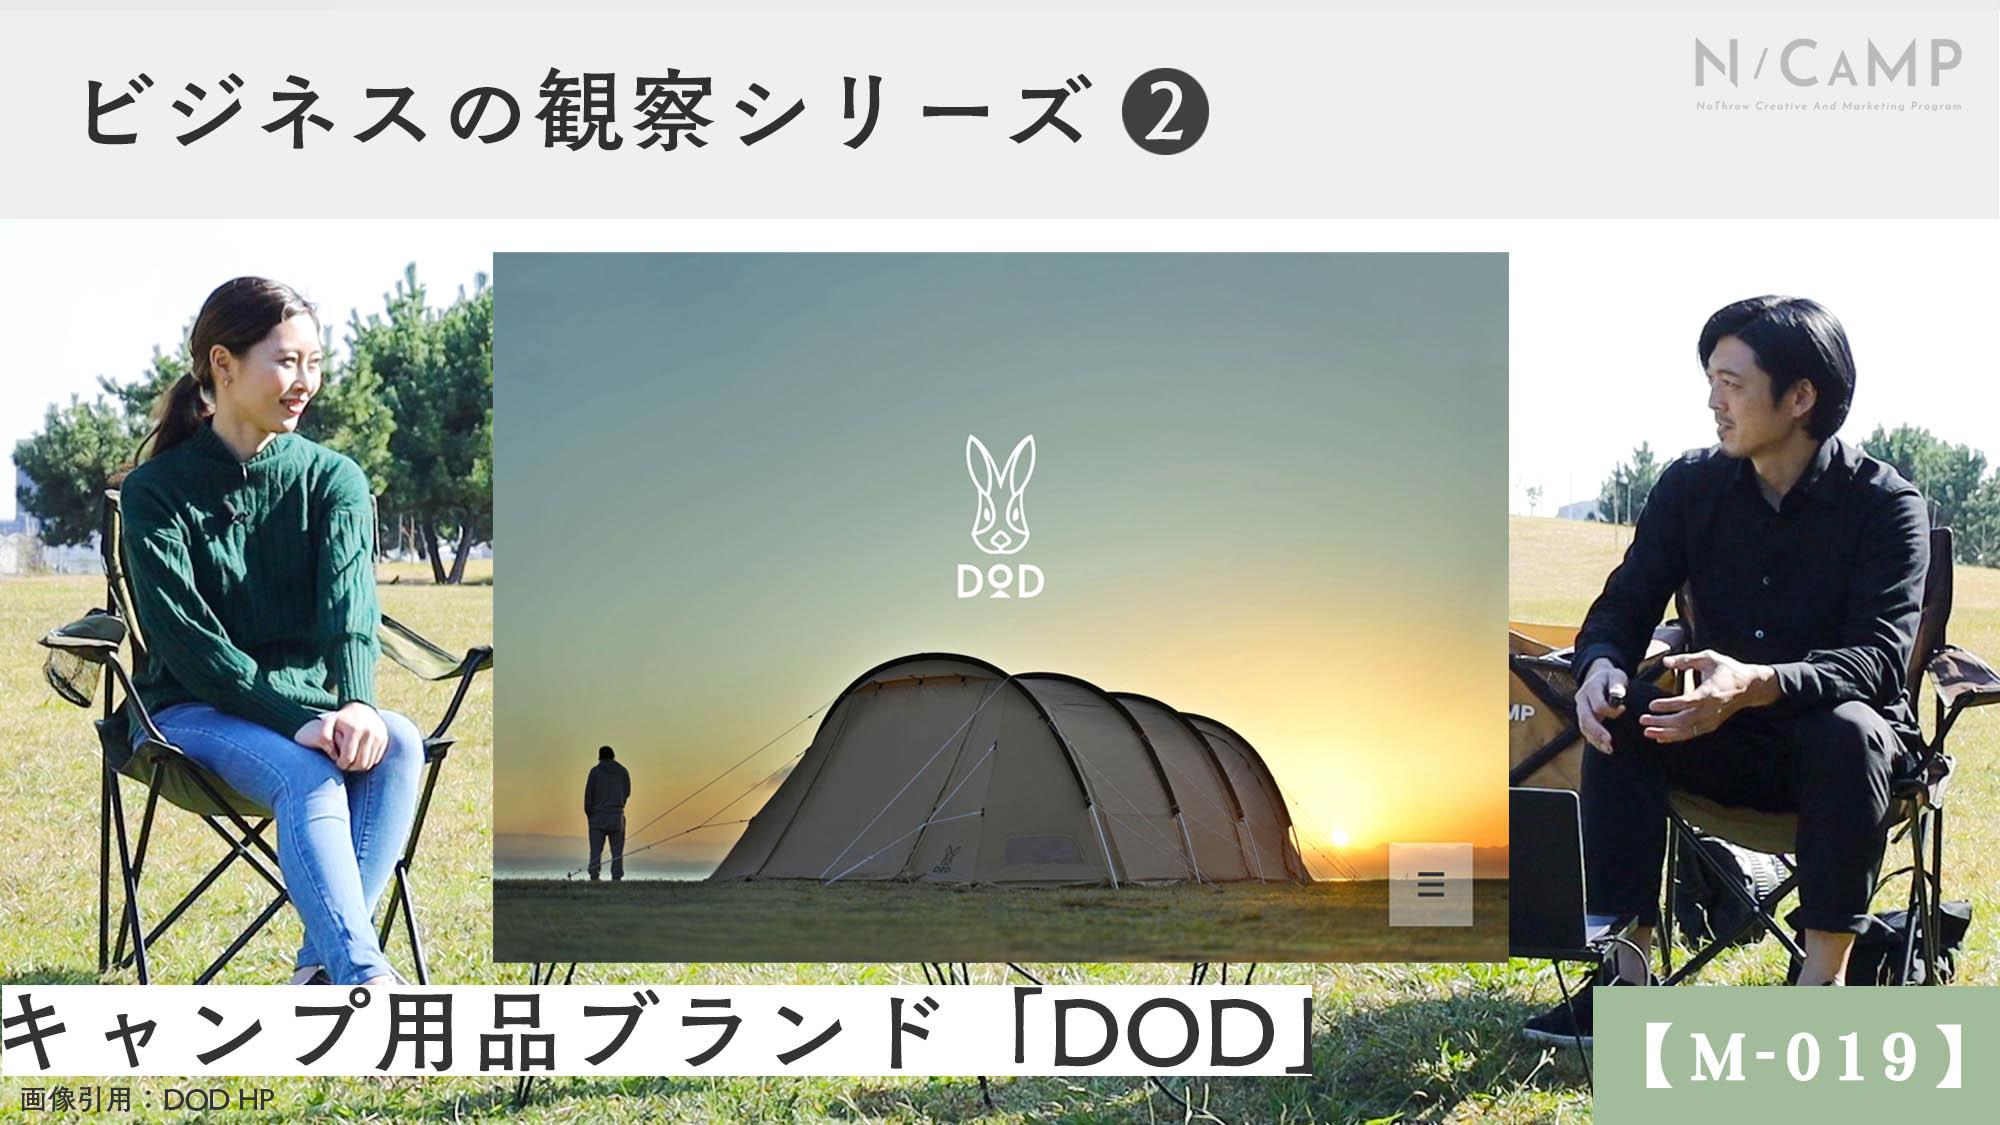 【M-019】ビジネスの観察シリーズ(2)_DOD